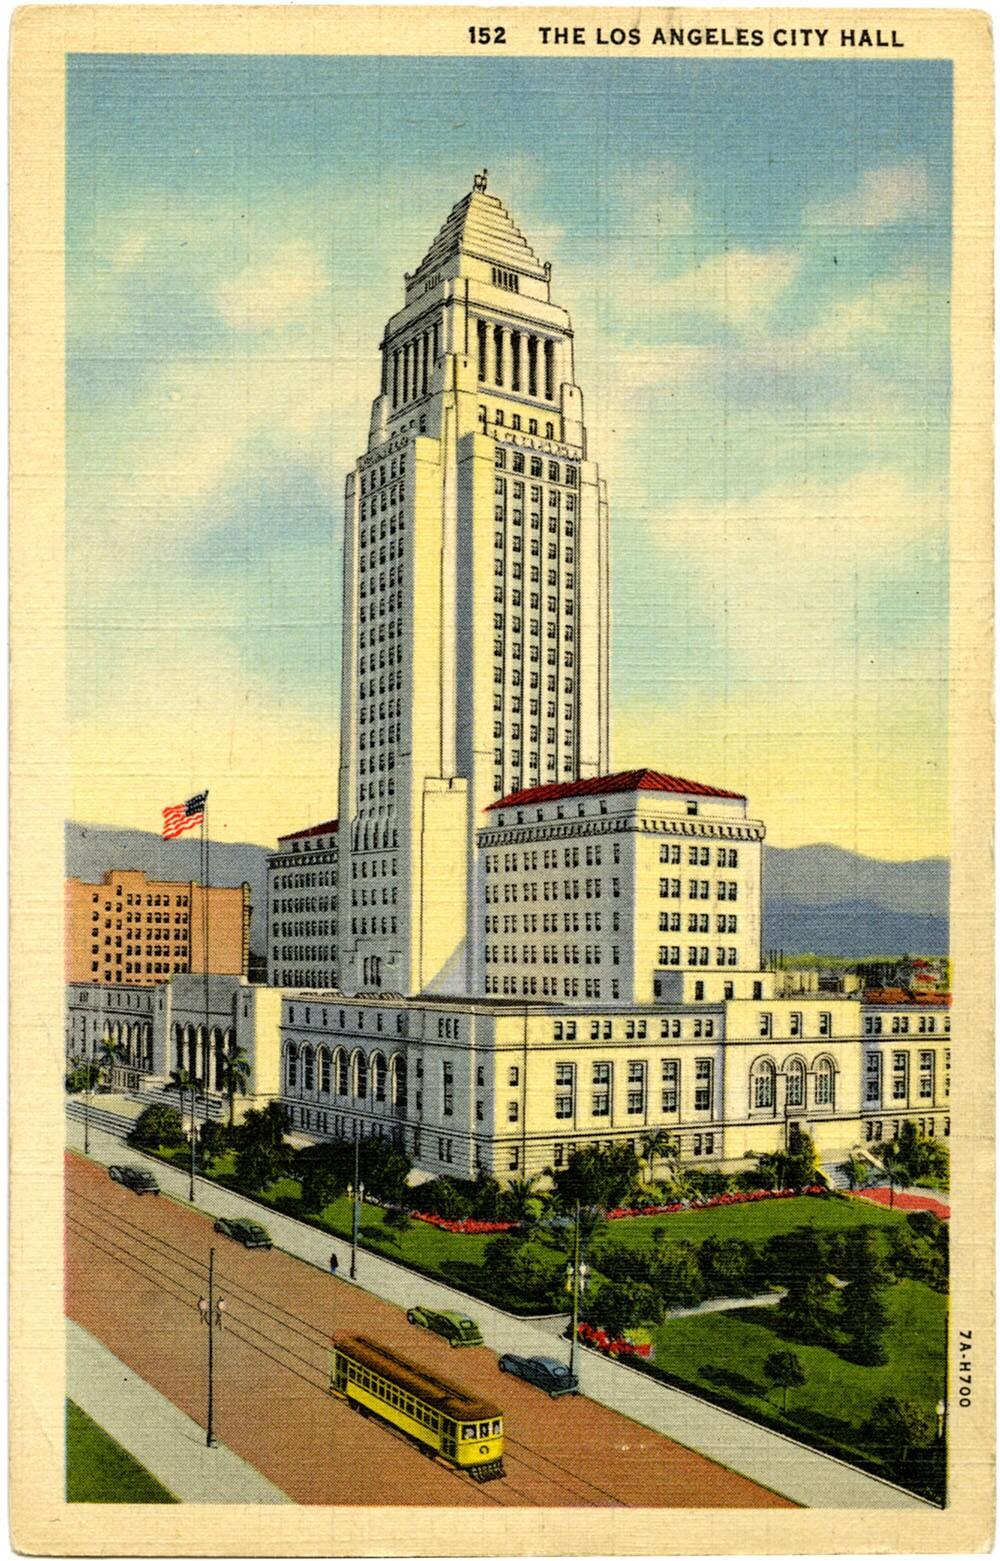 Postcard of Los Angeles City Hall, circa 1938